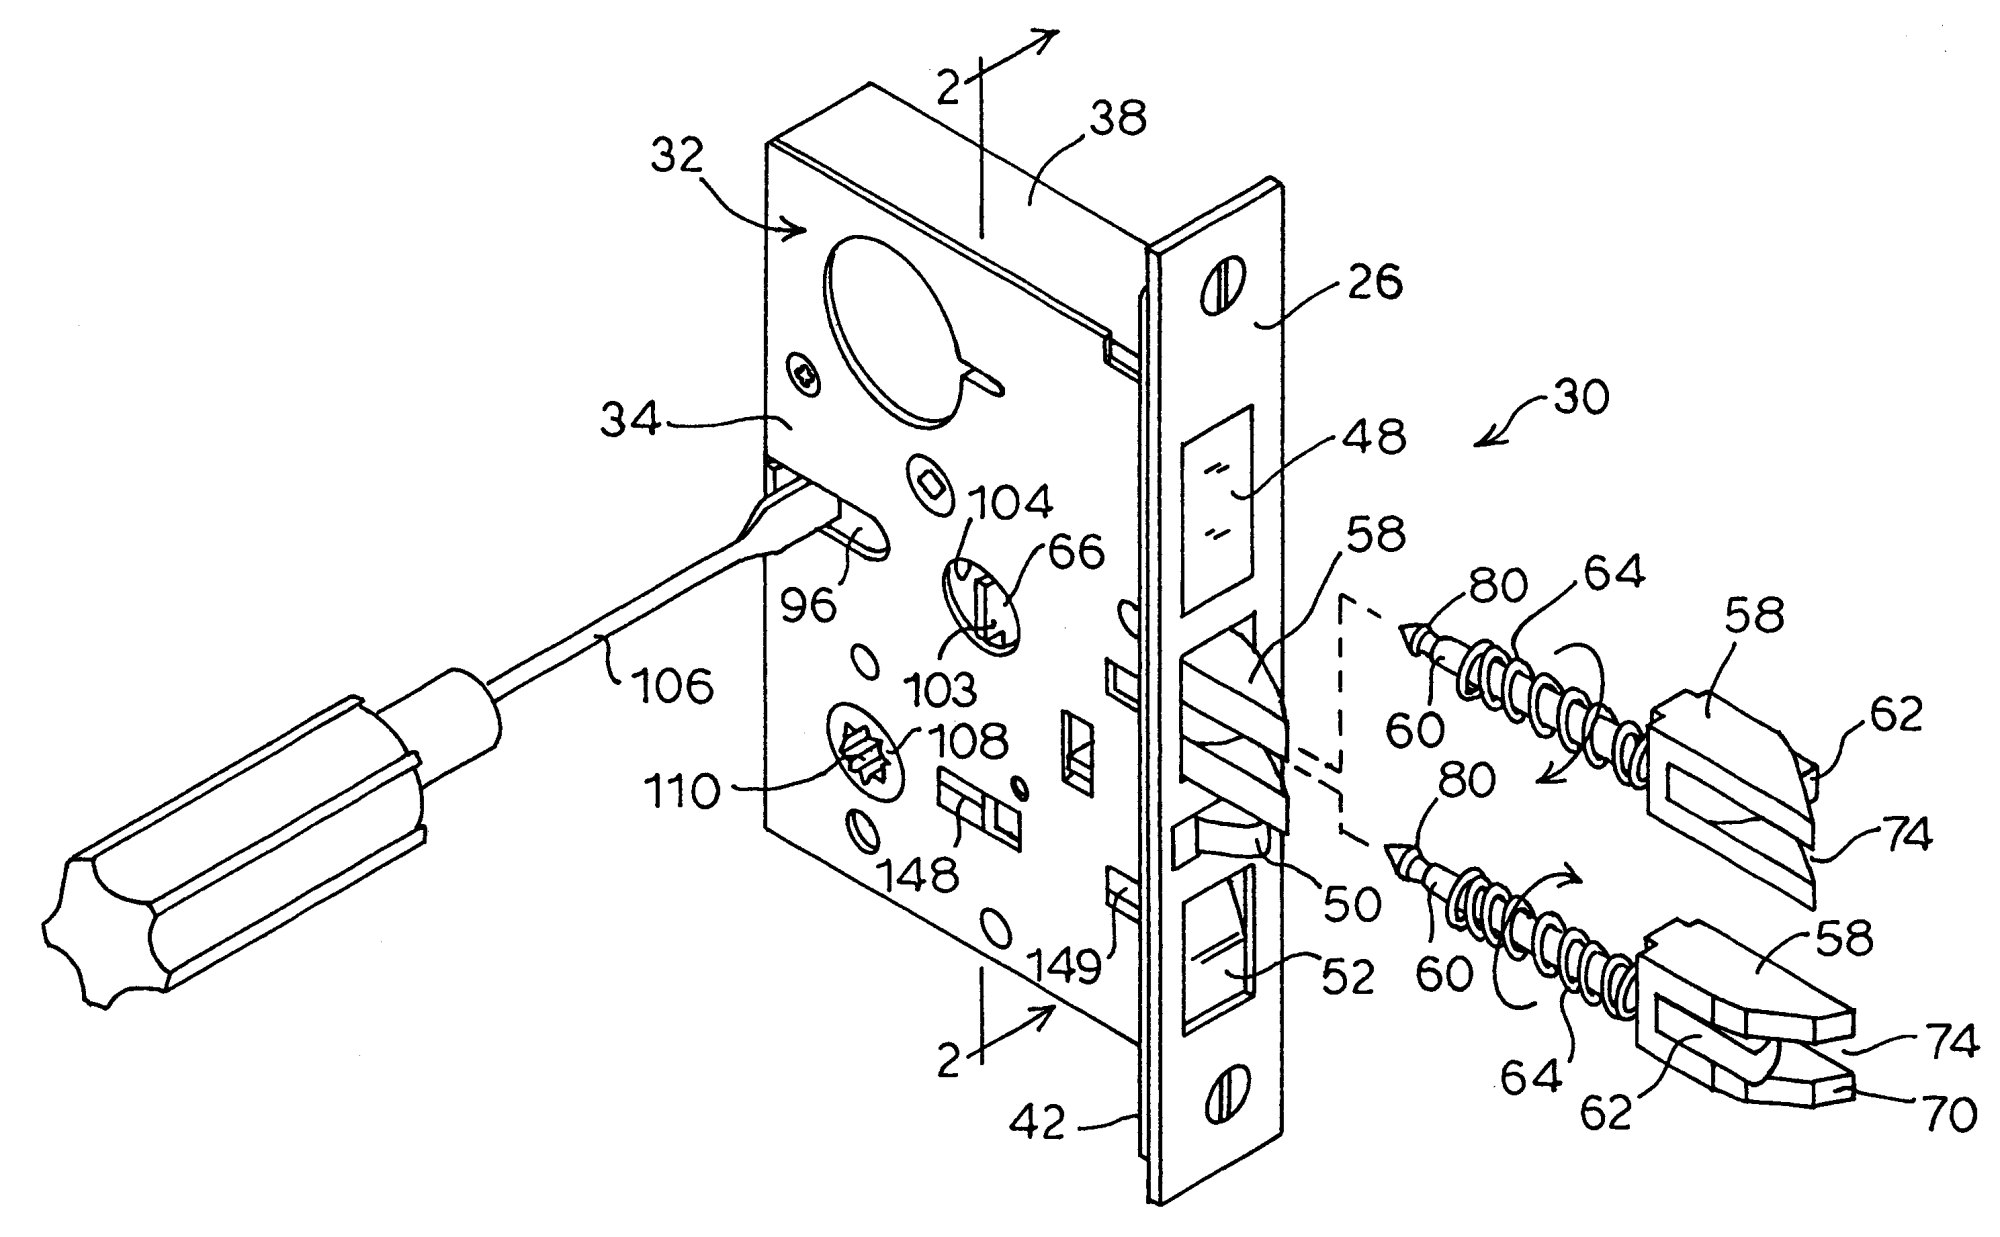 hight resolution of alkota wiring diagram autocar wiring diagram wiring autocar truck wiring diagram